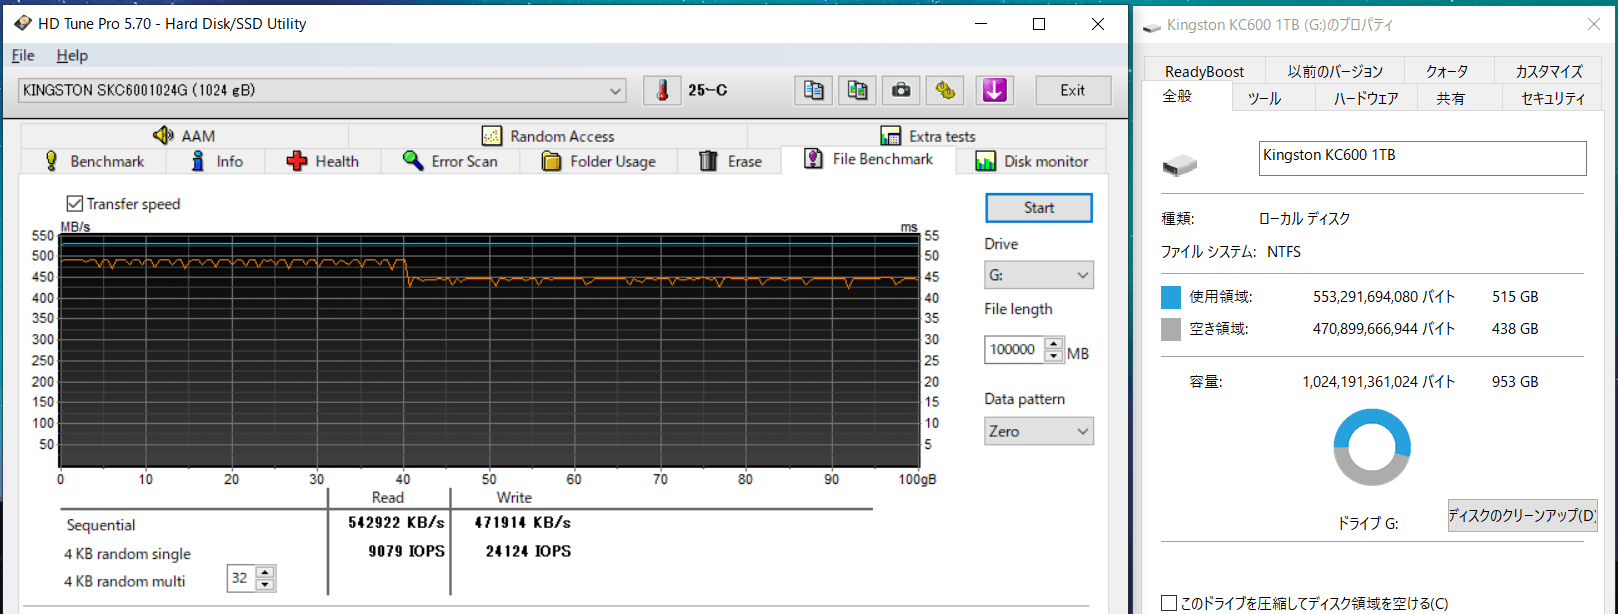 Kingston KC 600 1TB_HDT_500GB-Fill